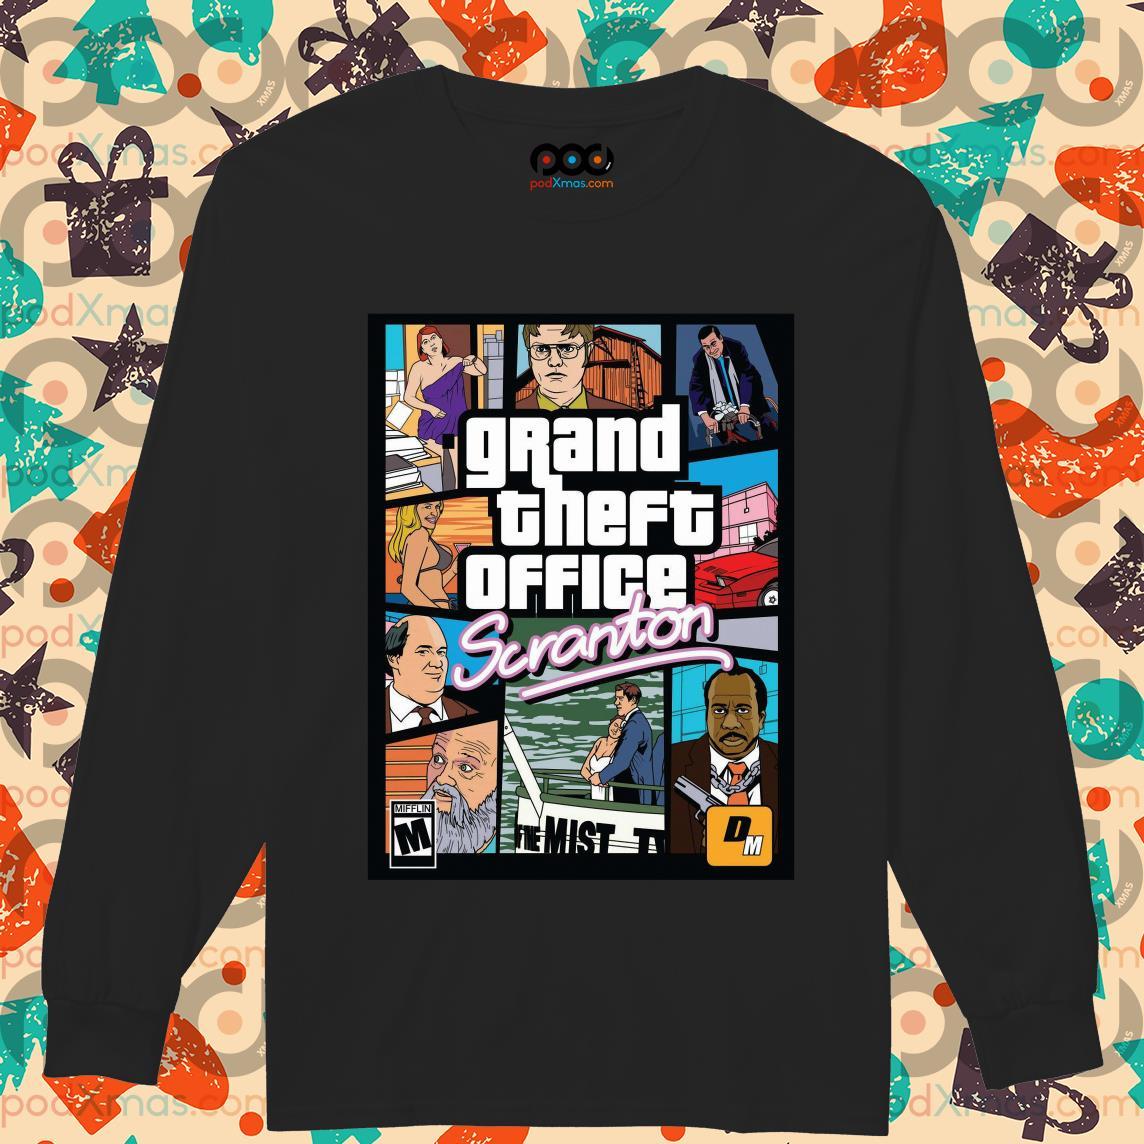 (Fast Shipping) Grand Theft Office Scranton Poster Shirt